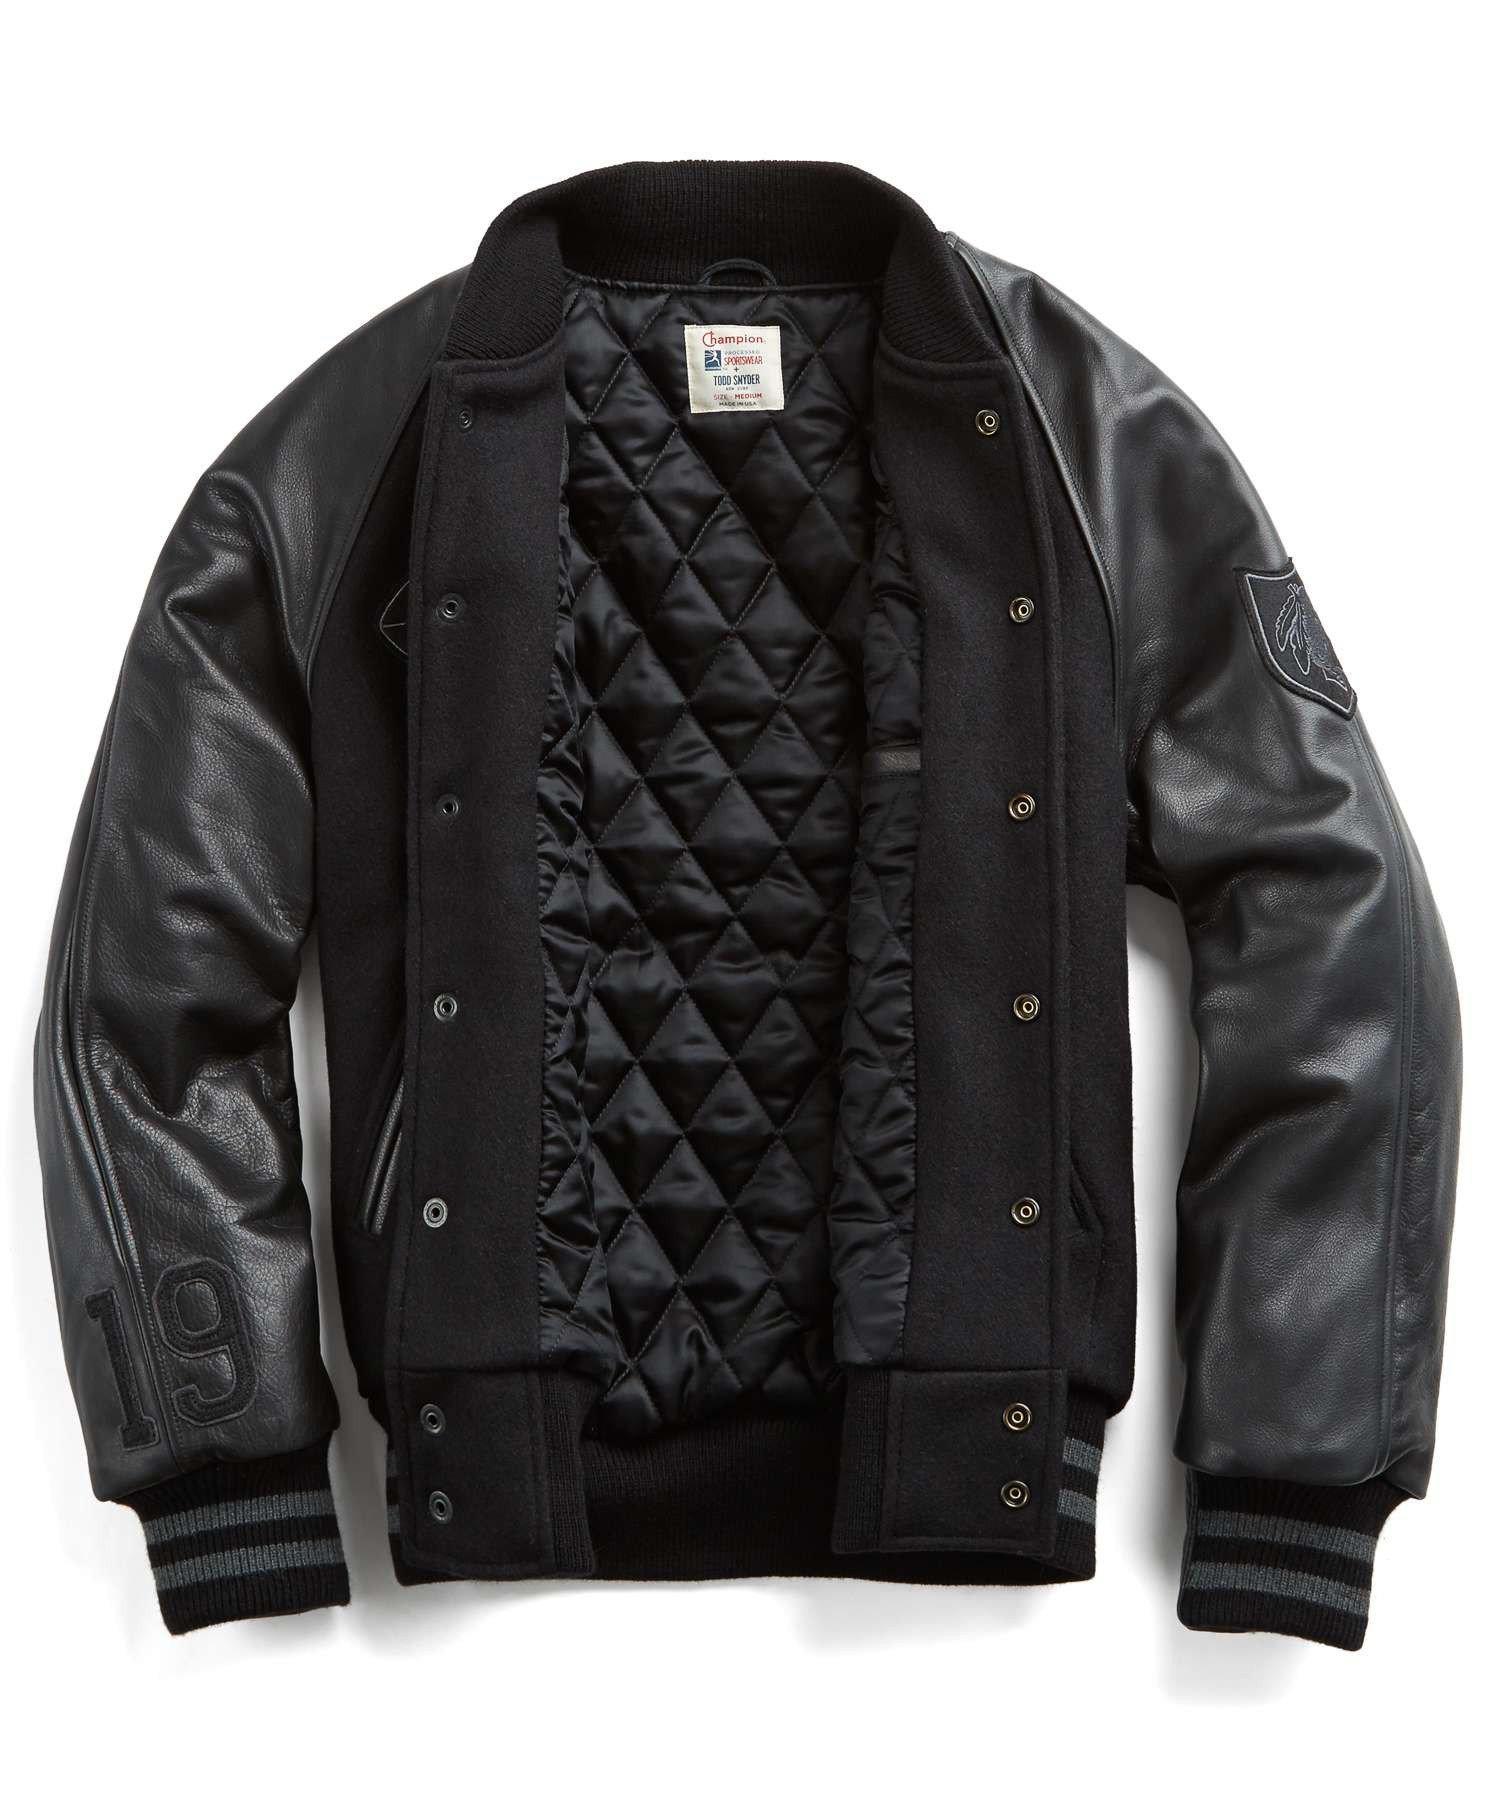 Wool varsity jacket with leather sleeves